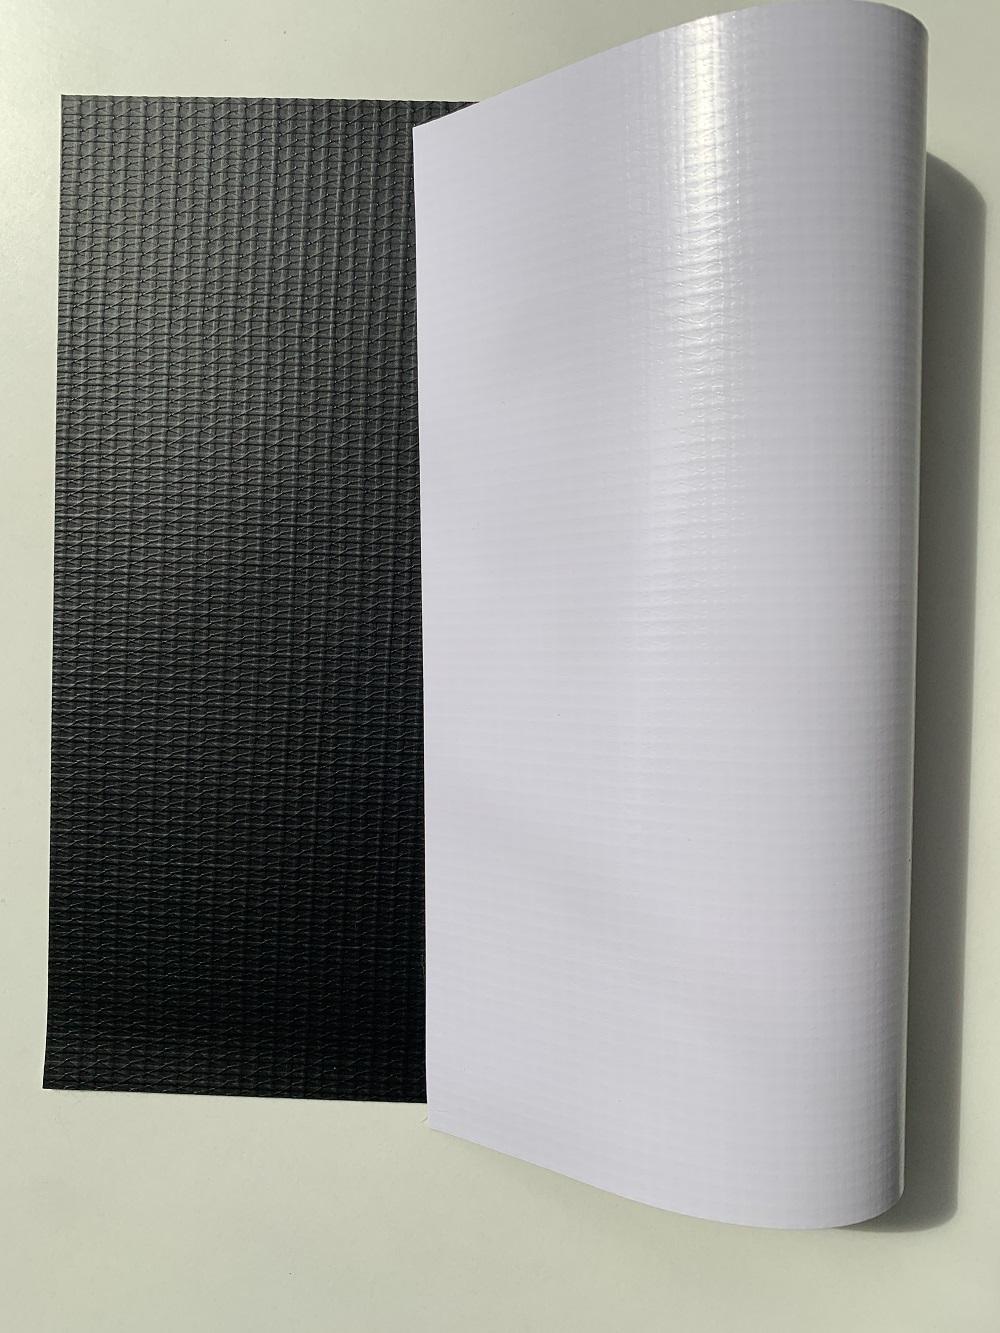 Lona Impressão Digital 280G Brilho F.Preto 1000x1000 3,2x50m